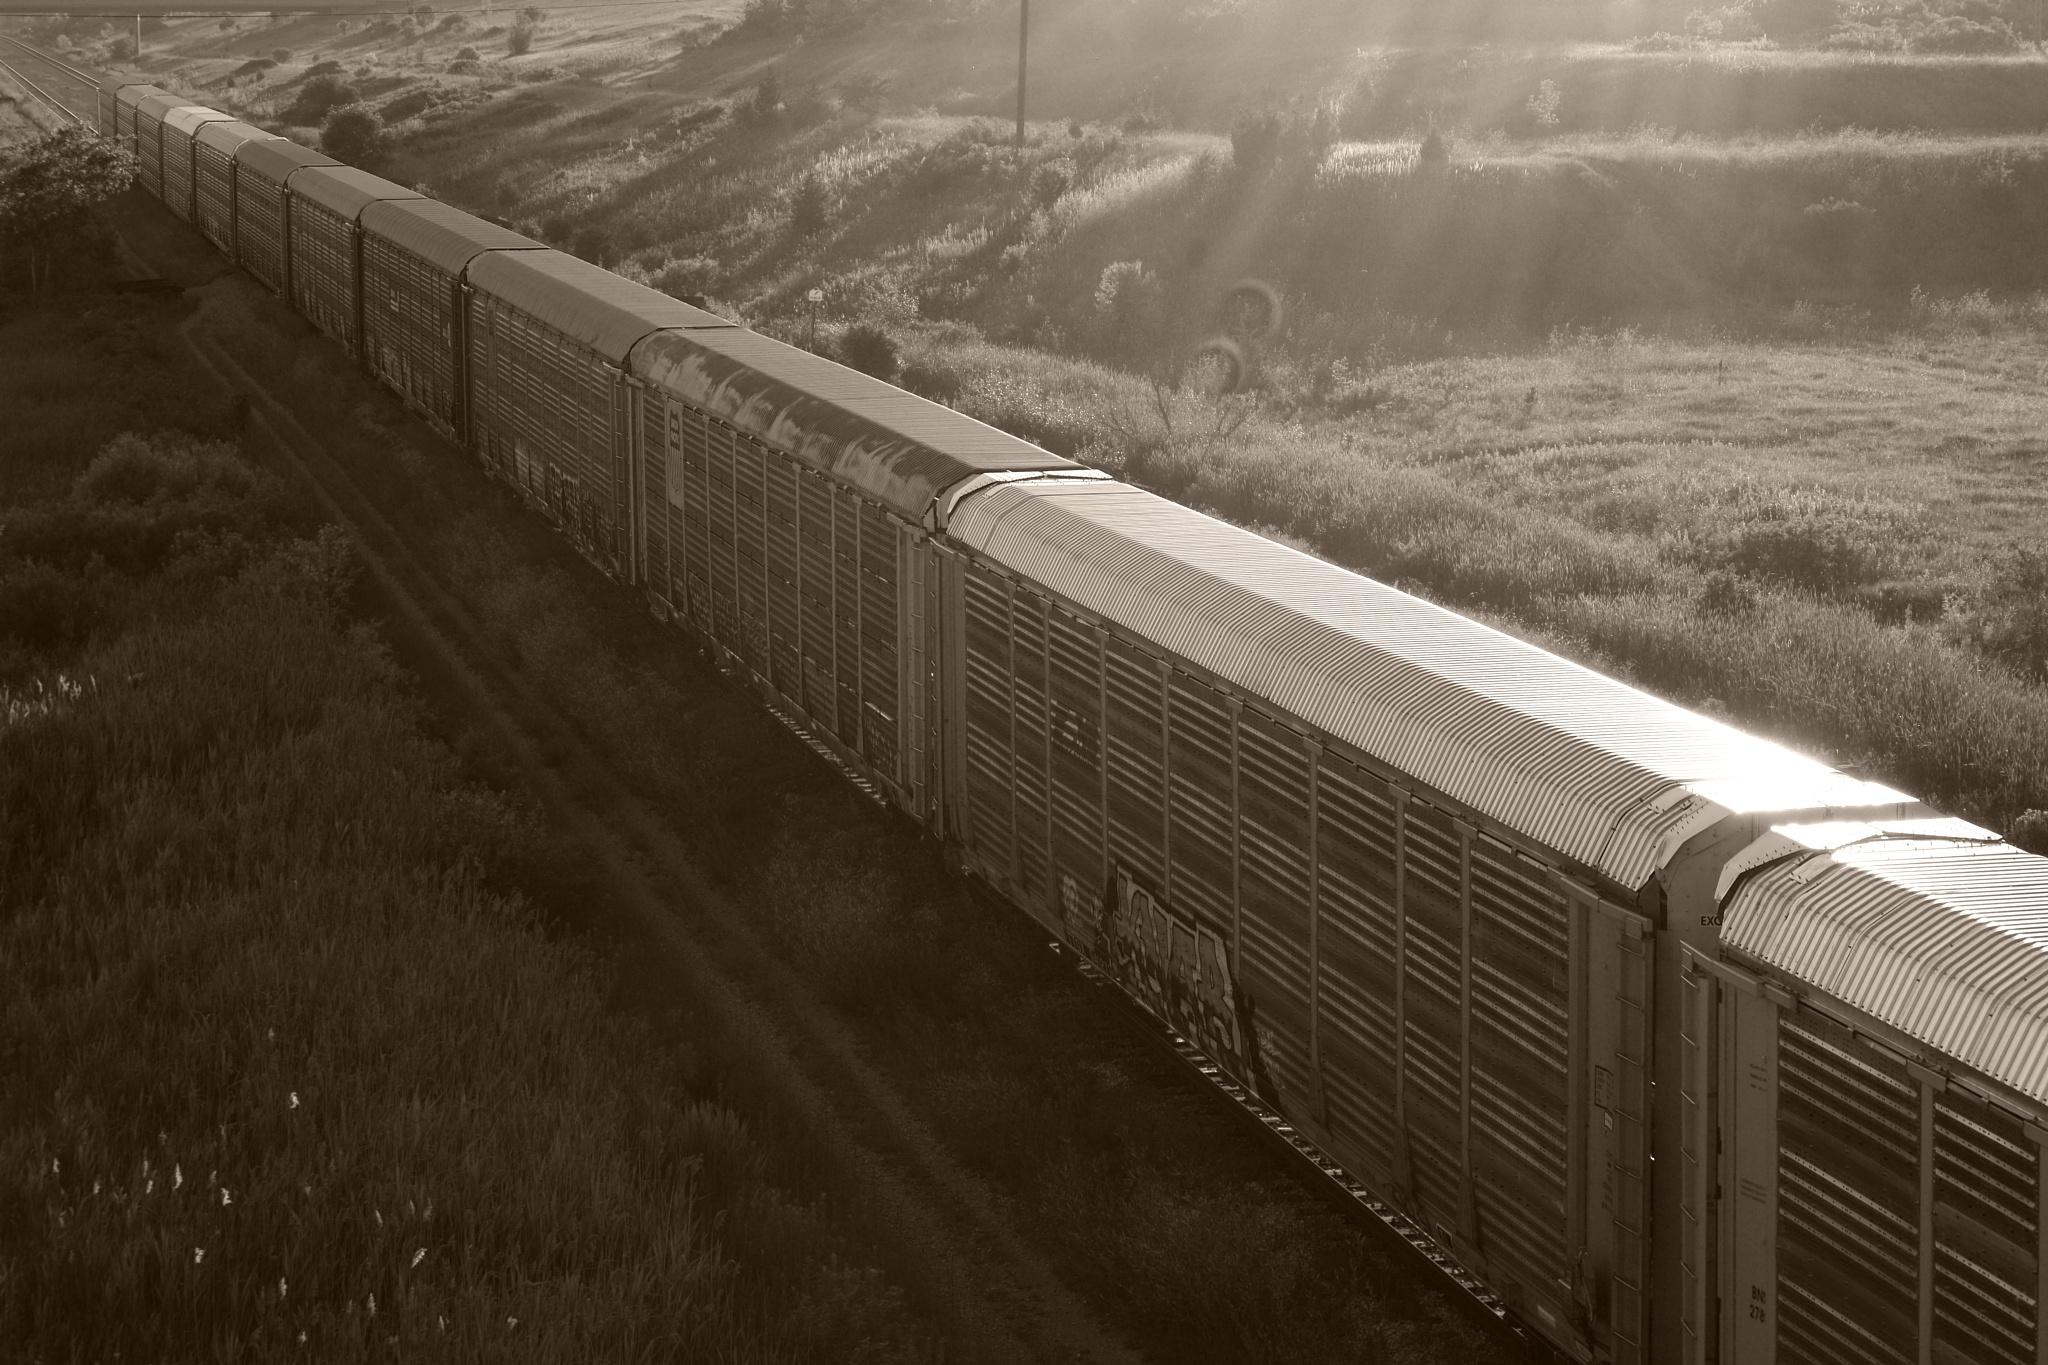 Sunshine Train by ʎpɐן uɐıpɐuɐɔ